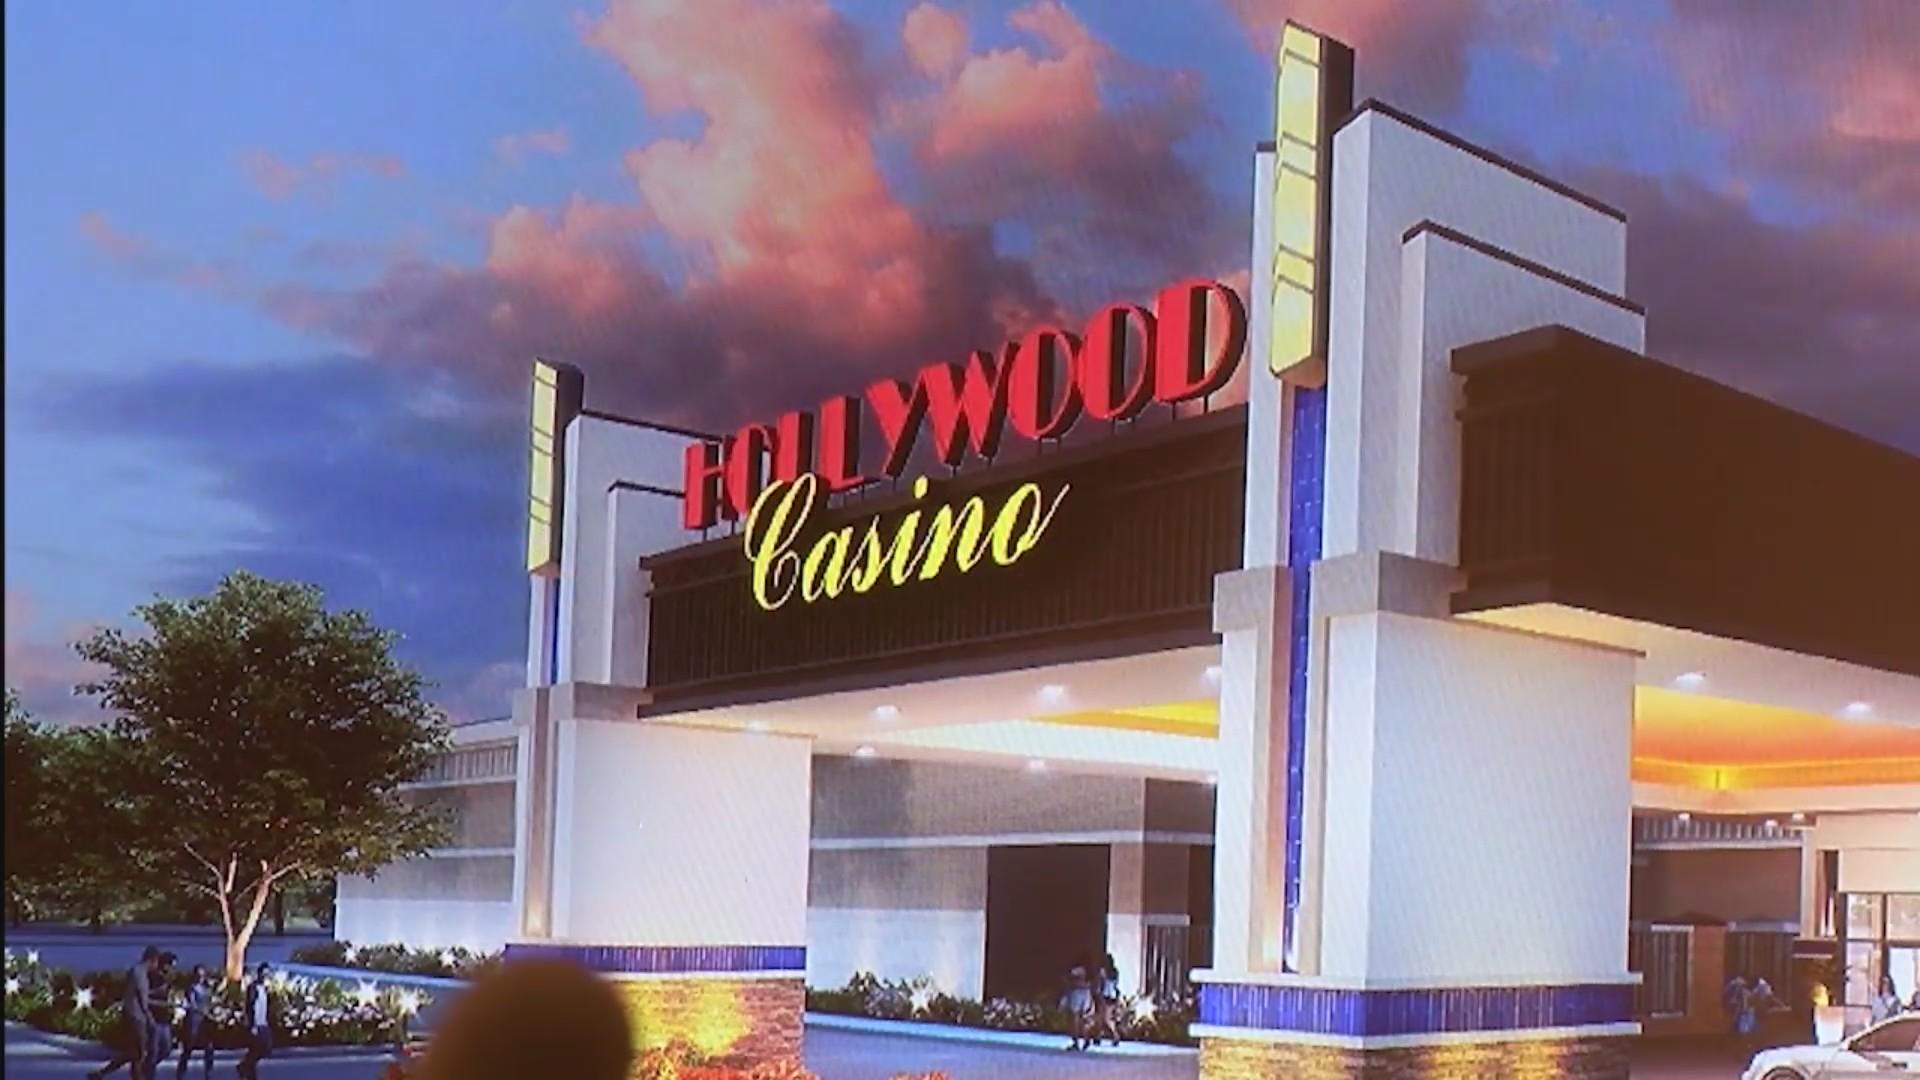 York mini-casino one step closer to reality